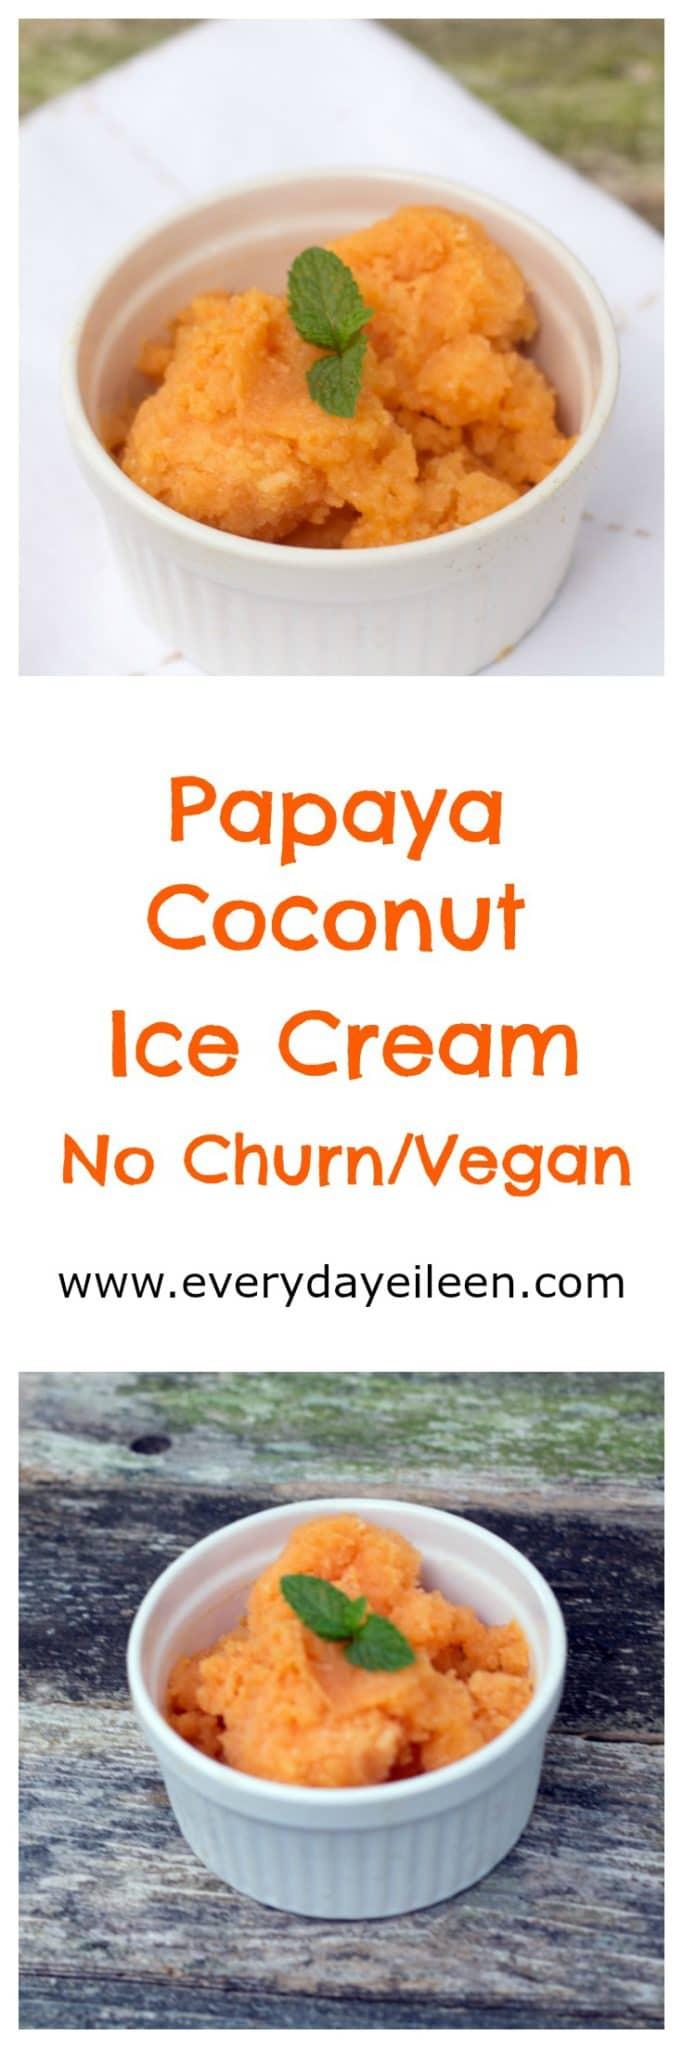 papaya coconut no churn vegan ice cream